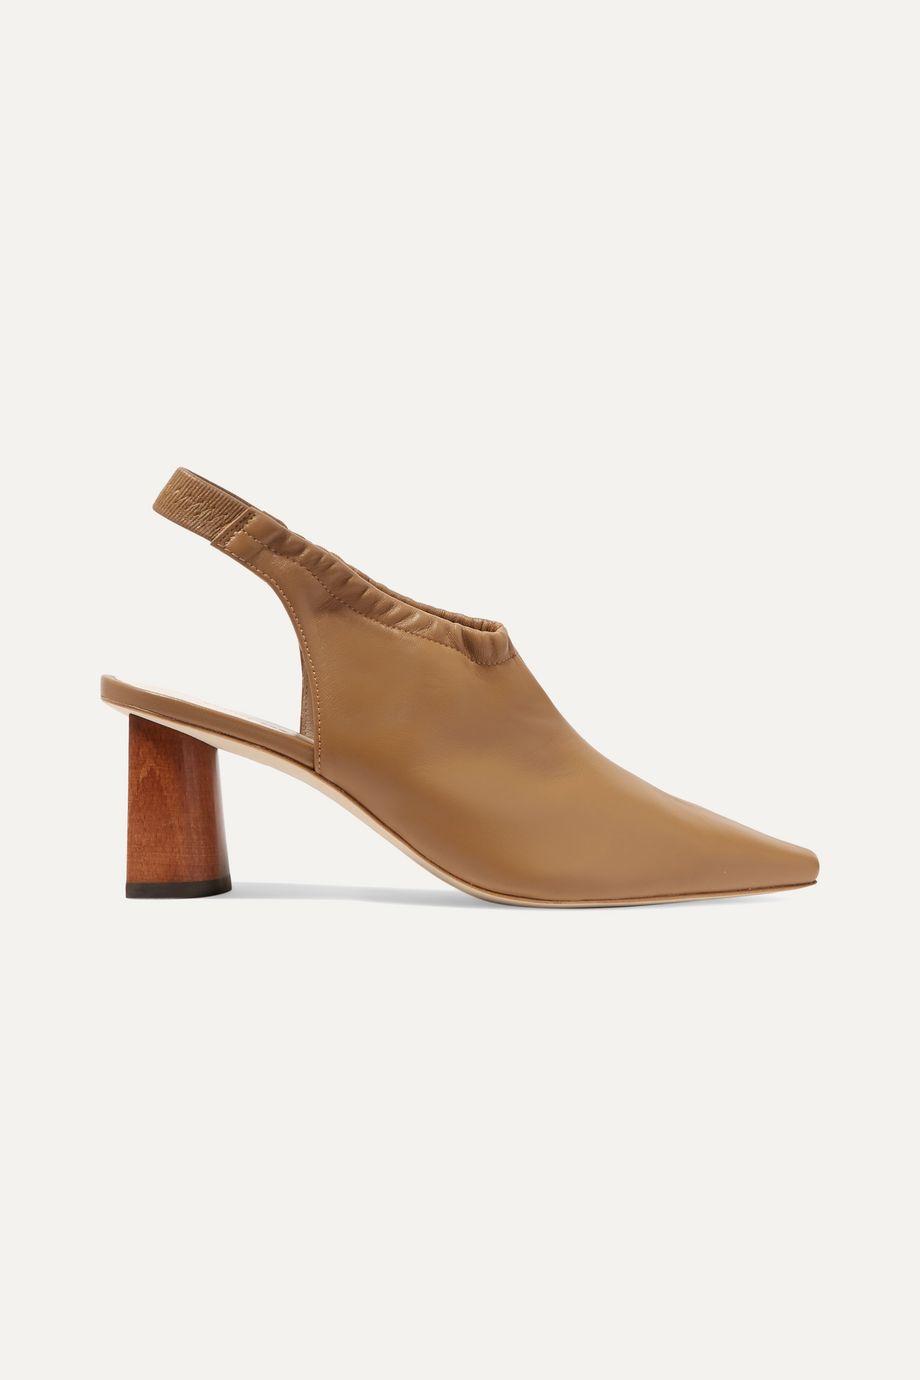 REJINA PYO Riley leather slingback pumps